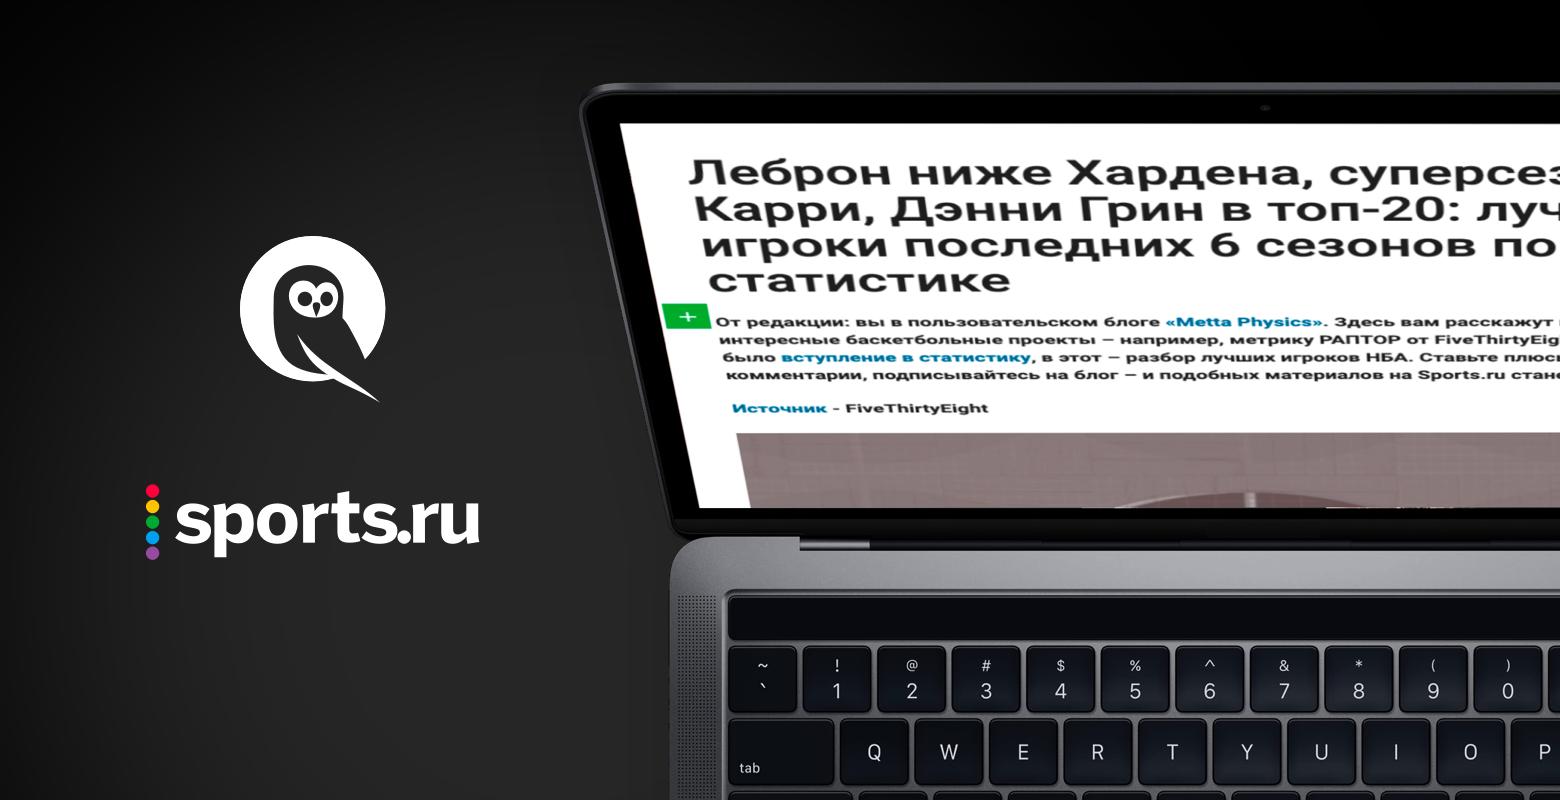 Как в Sports.ru писали свой WYSIWYG-редактор - 1